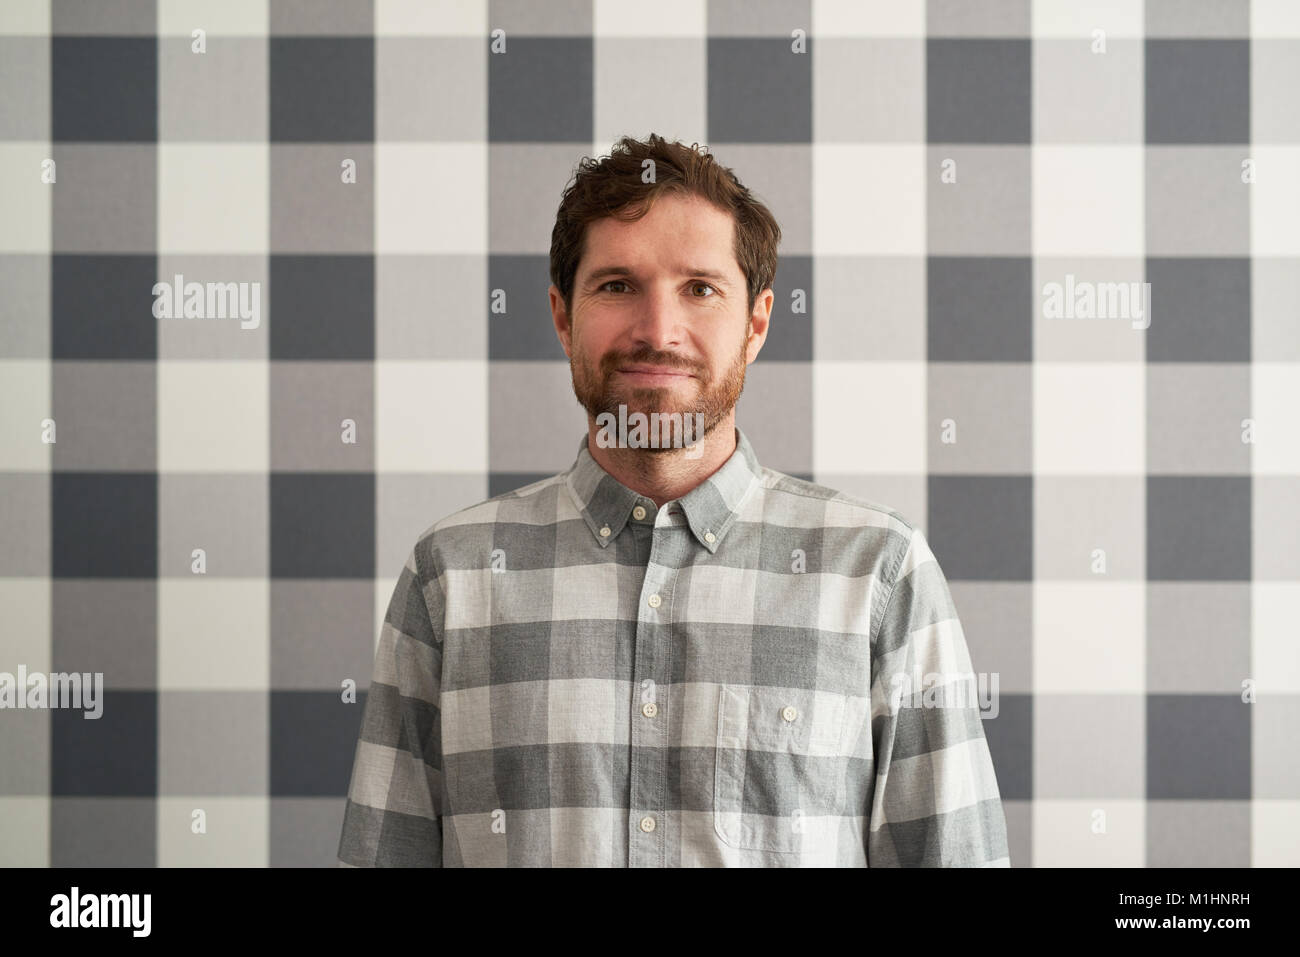 Smiling young man wearing a checkered shirt matching his wallpaper - Stock Image